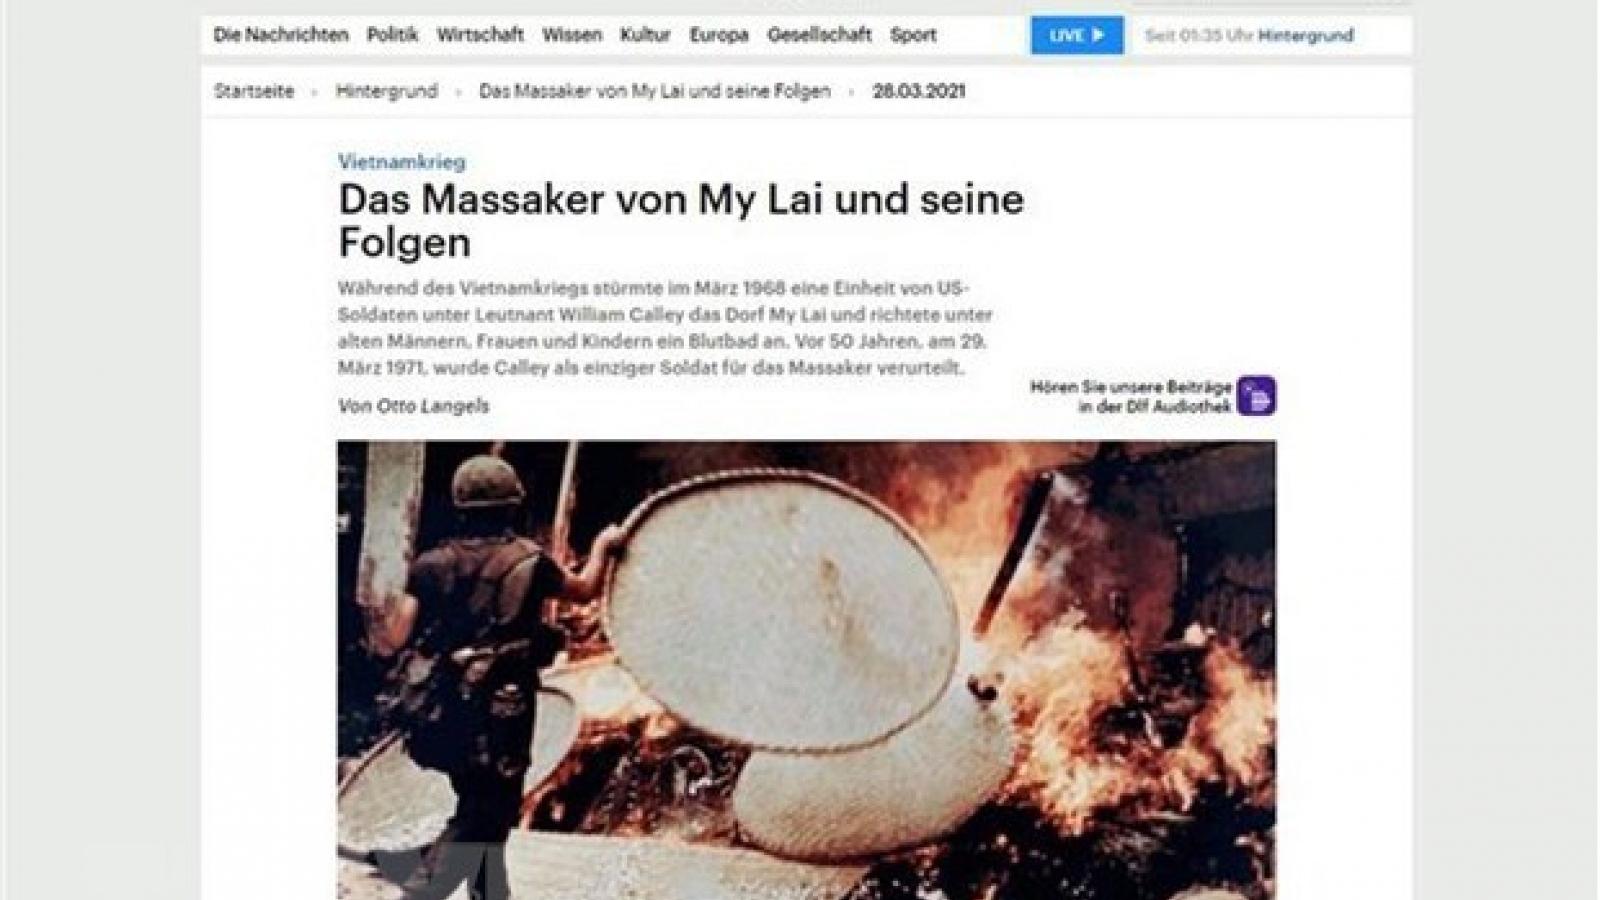 German historian: My Lai massacre a terrible war crime